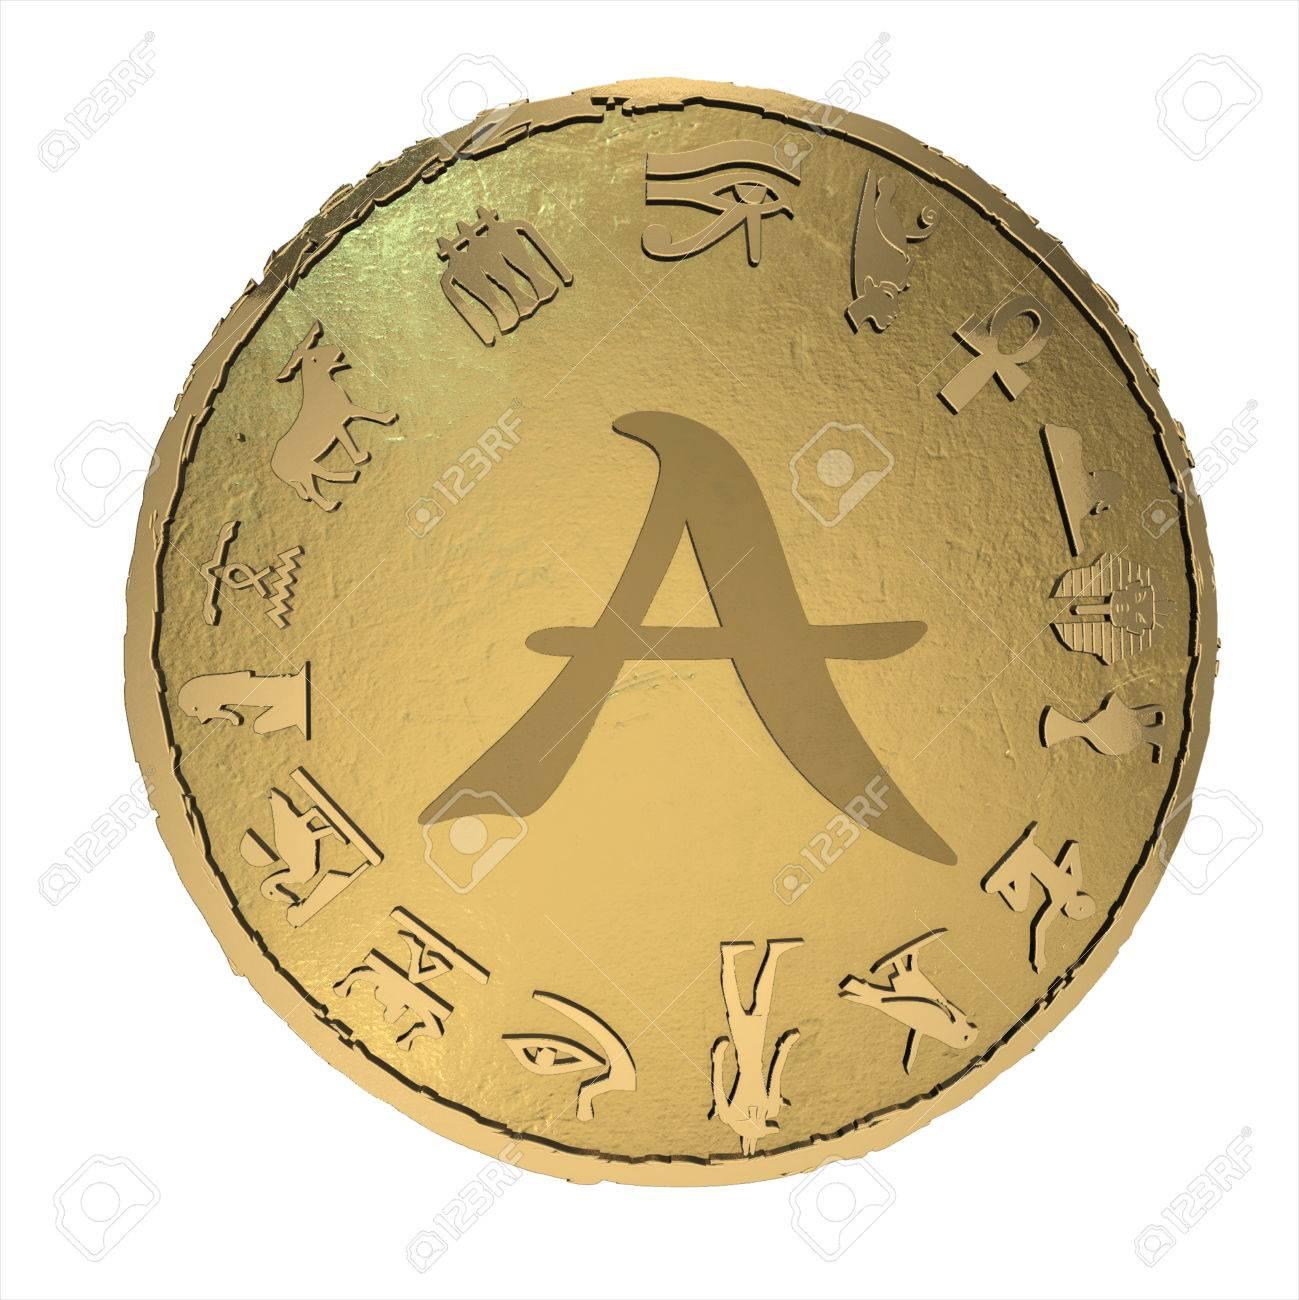 3d golden ancient egypt money stock photo picture and royalty 3d golden ancient egypt money stock photo 54660078 biocorpaavc Images